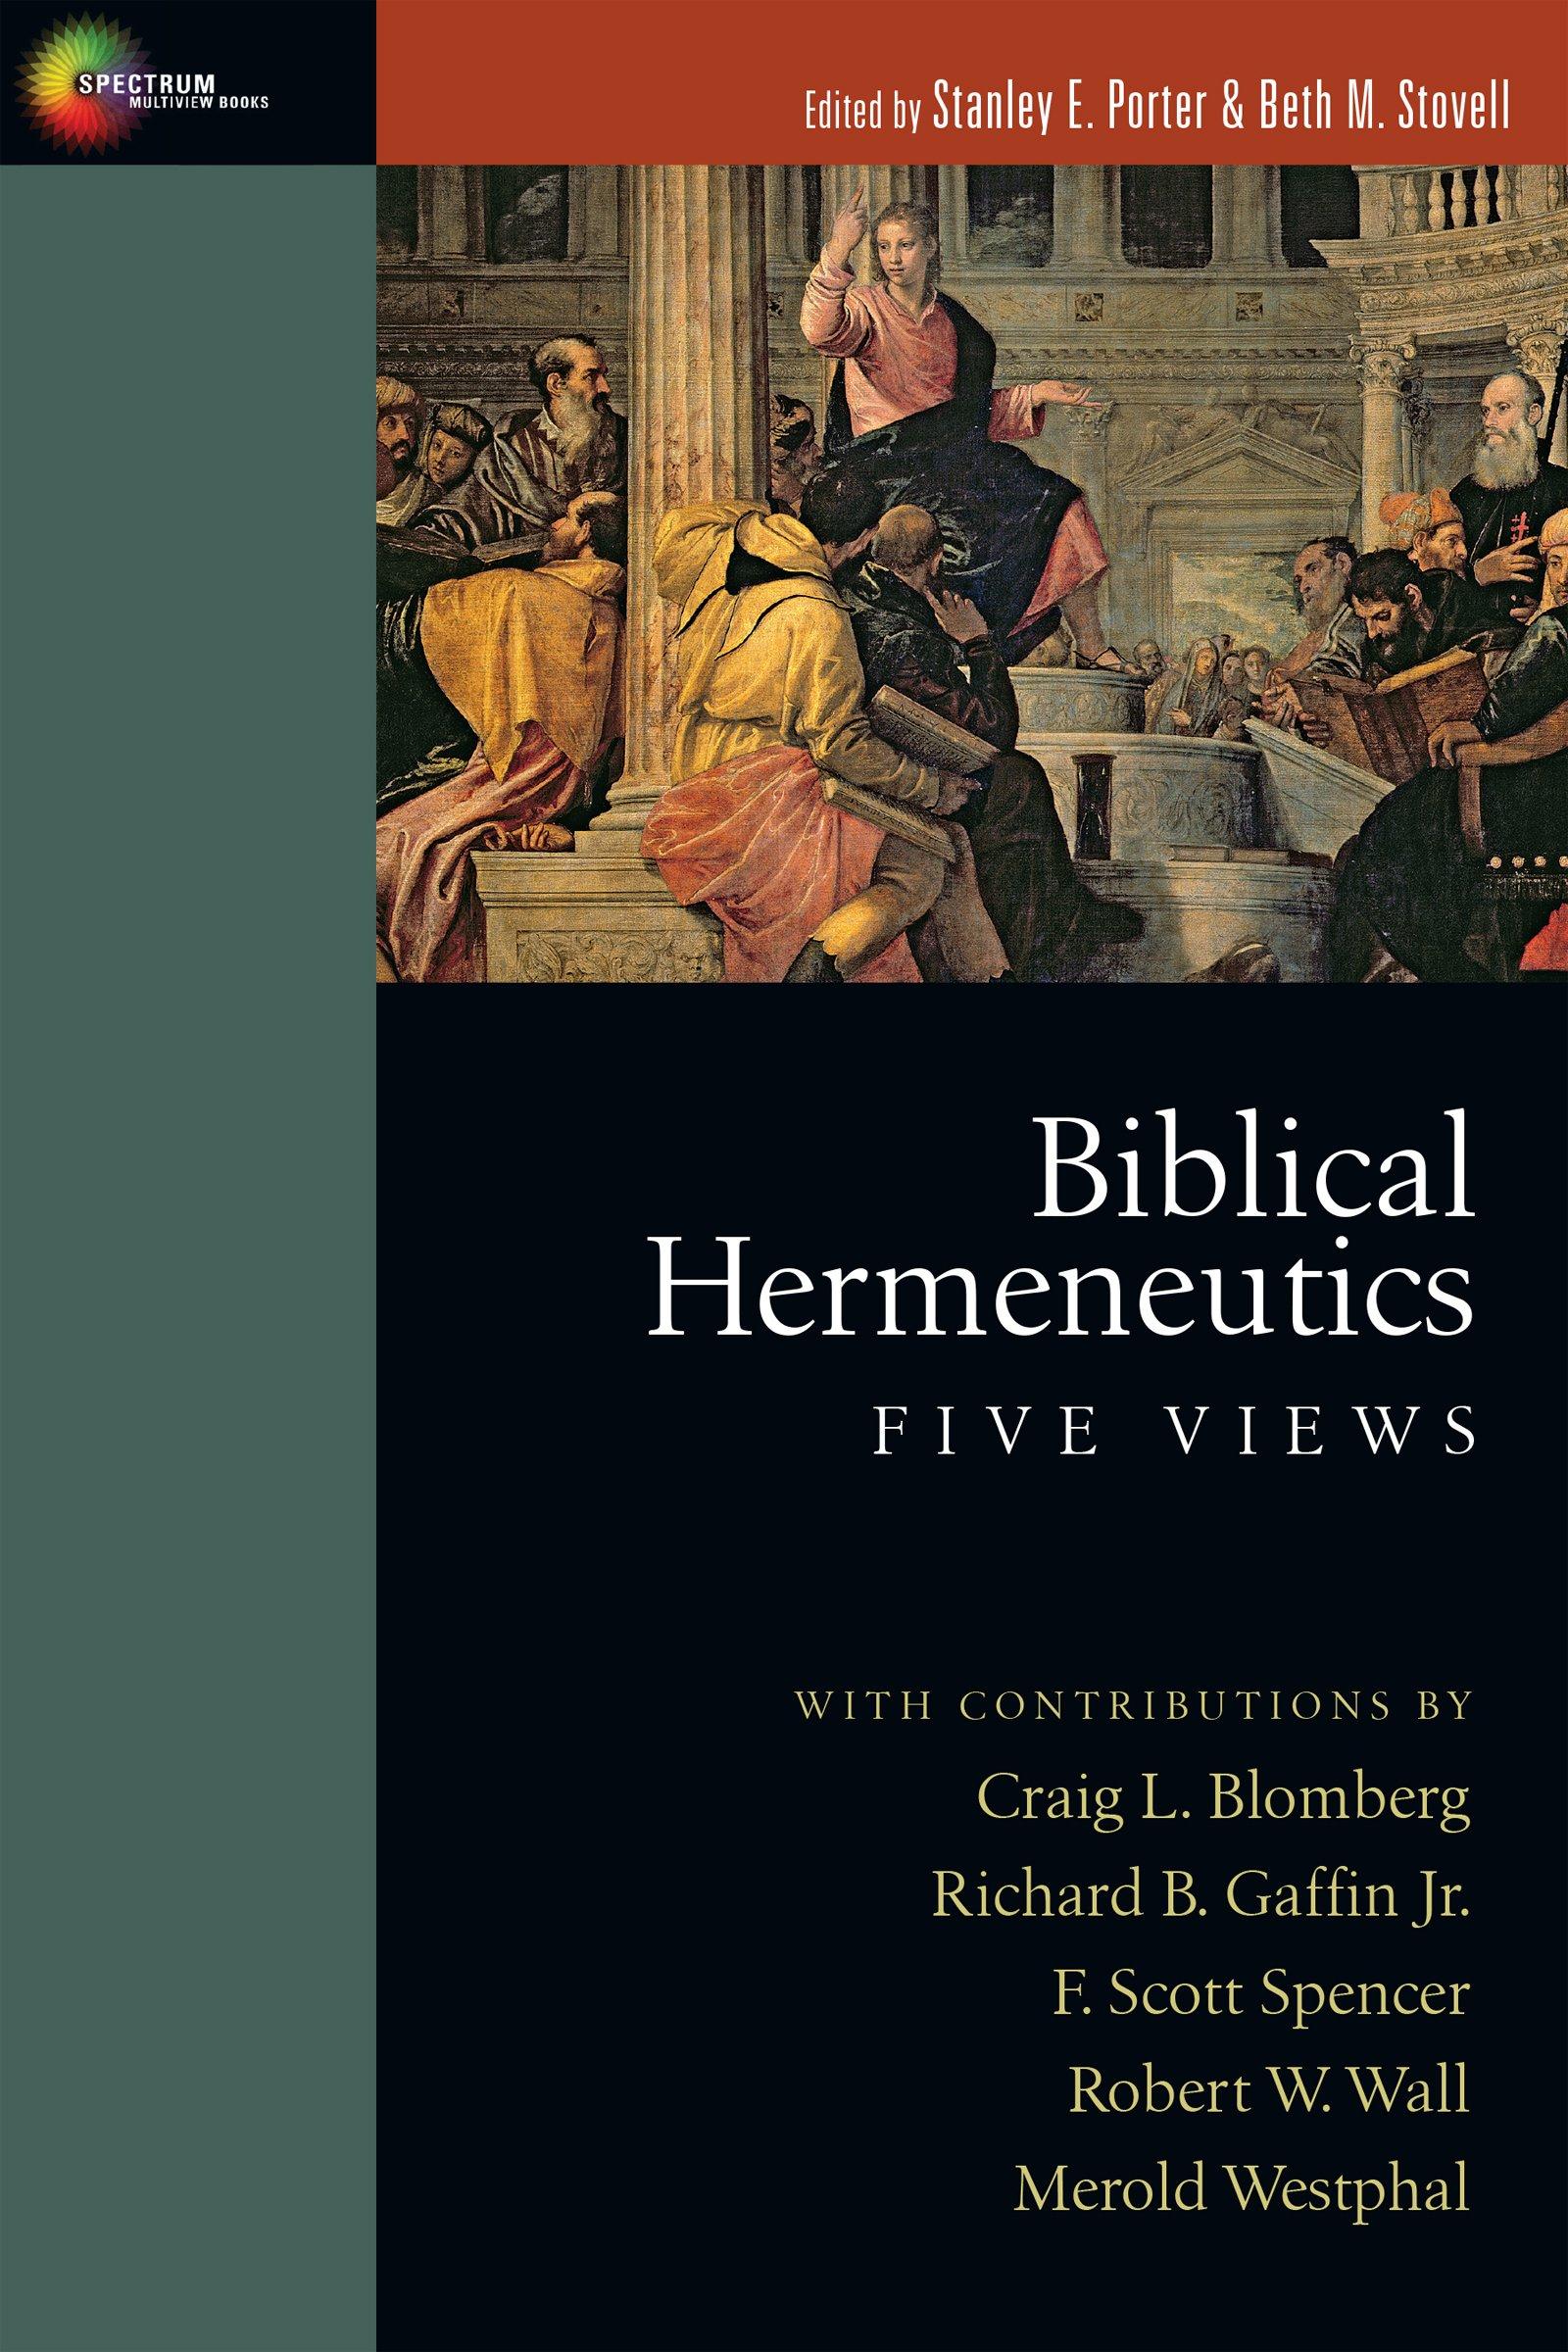 Biblical Hermeneutics: Five Views (Spectrum Multiview Books)